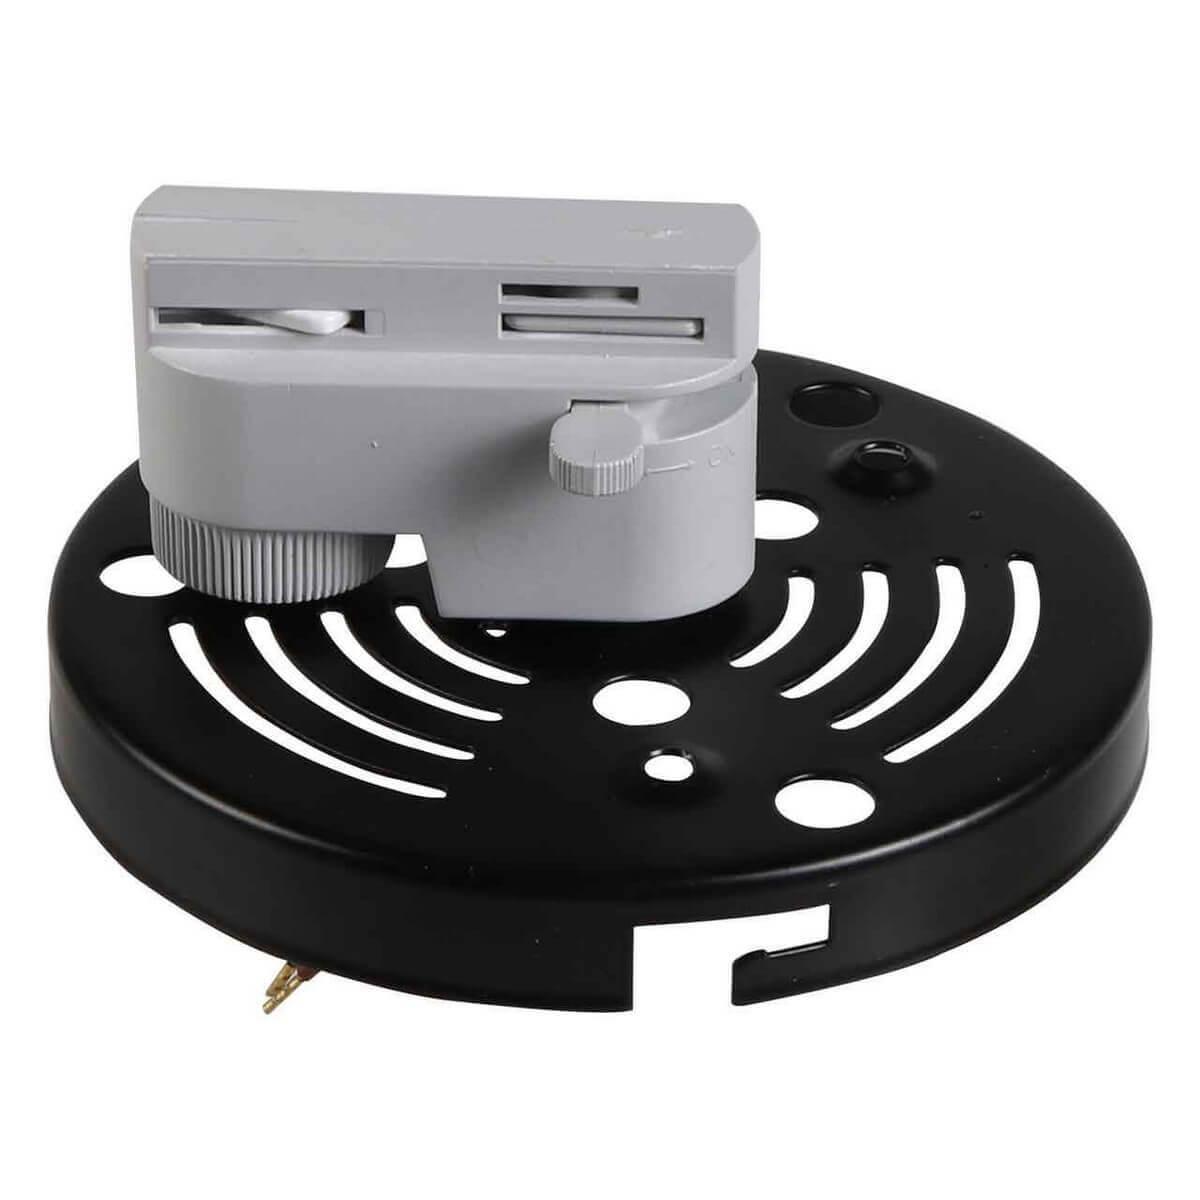 Адаптер для шинопровода Lightstar 592069 Asta Gray (для однофазного шинопровода)